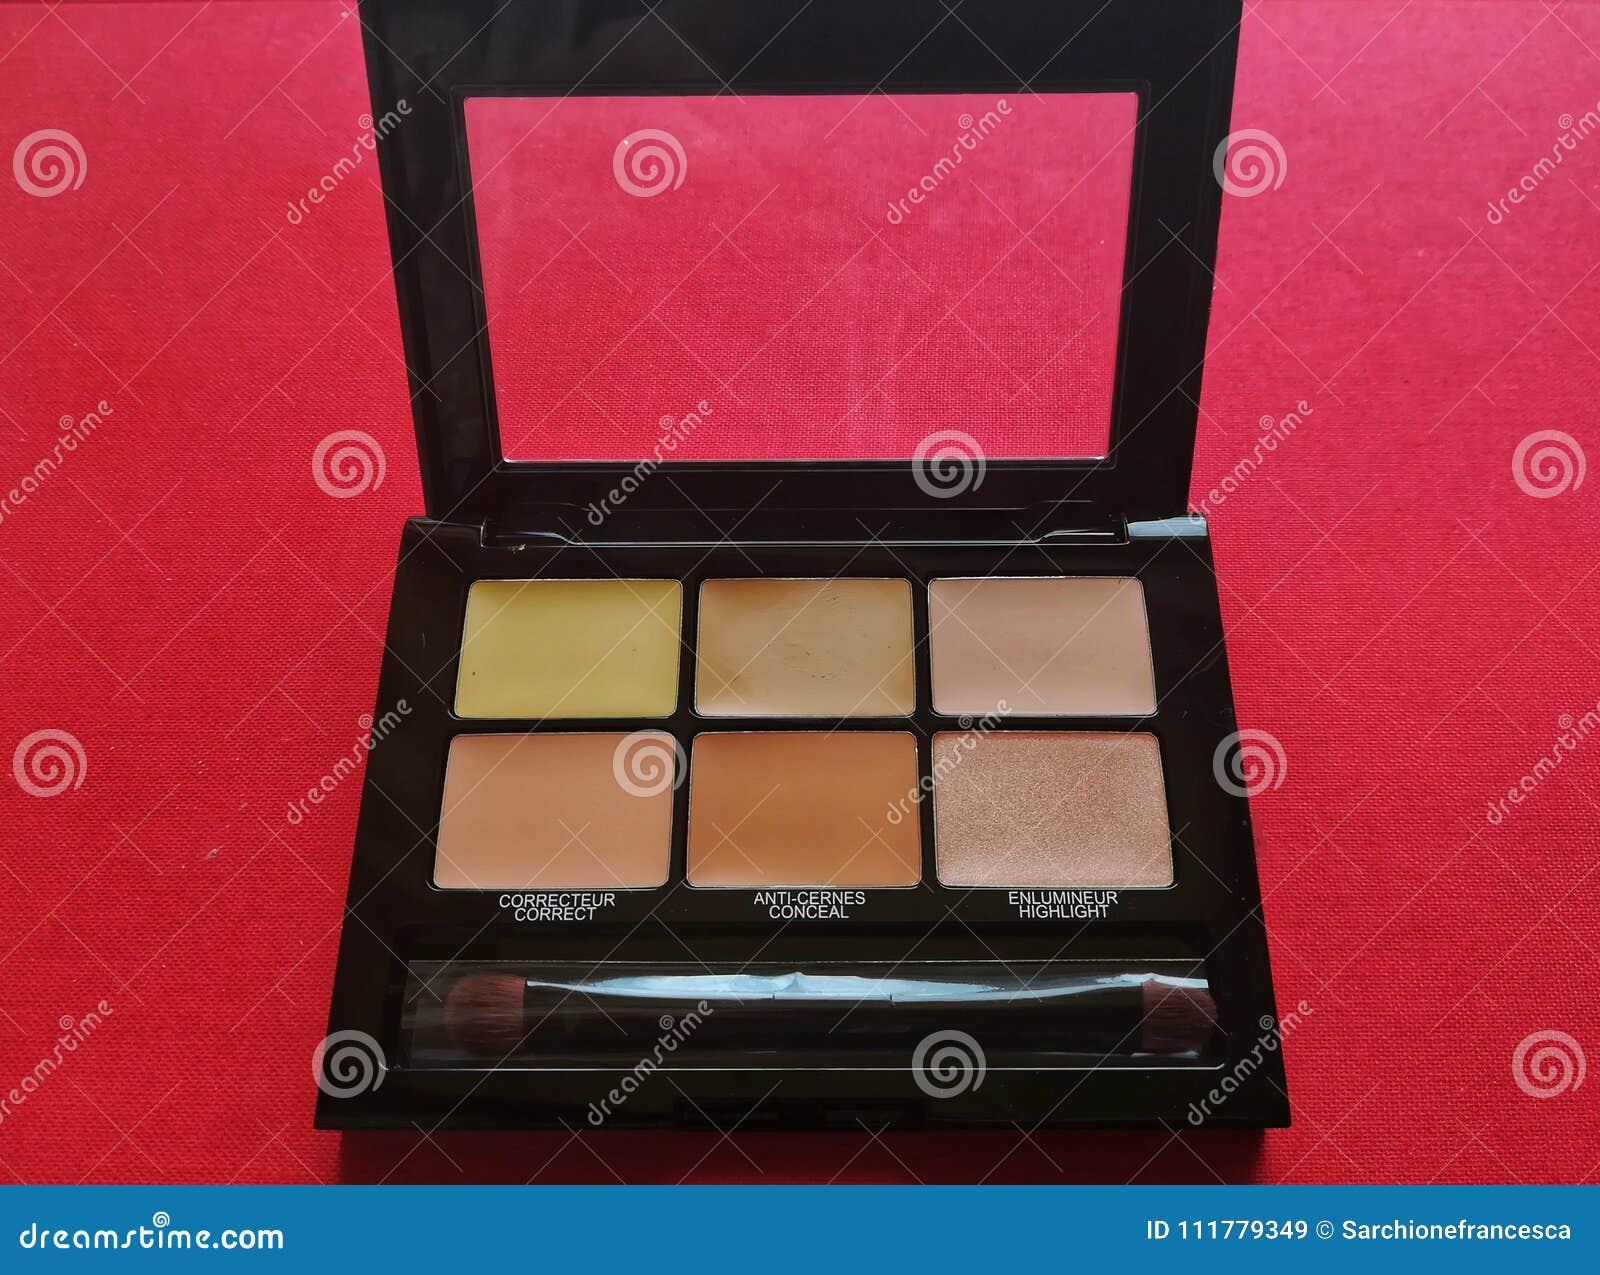 A beauty product